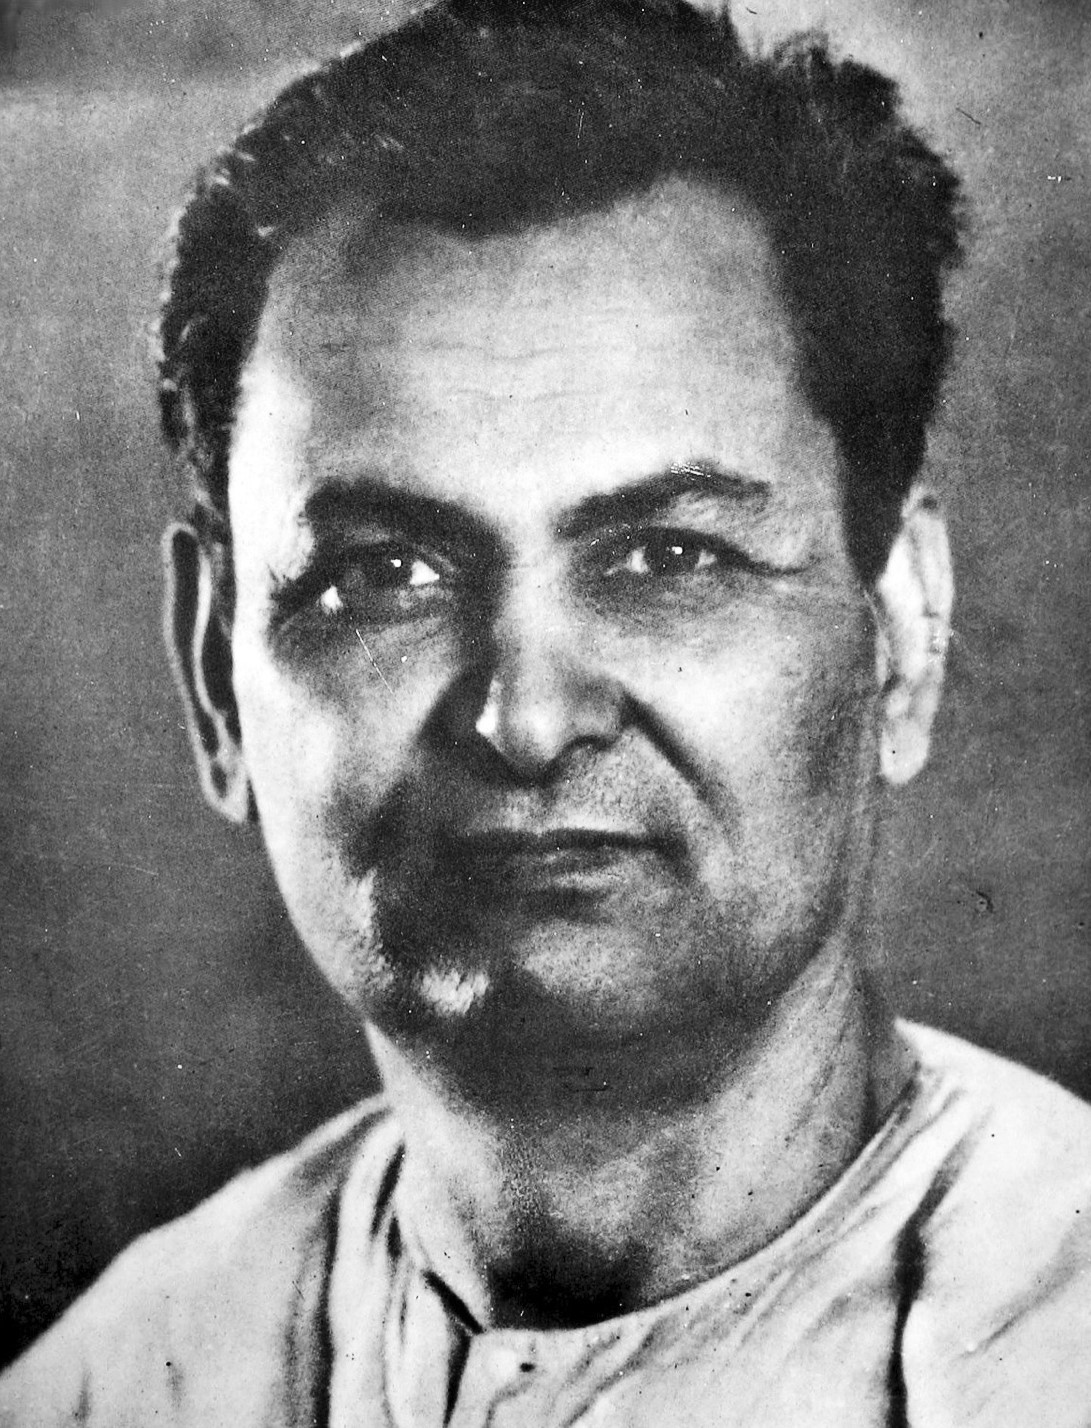 Rahul Sankrityayan राहुल सांकृत्यायन